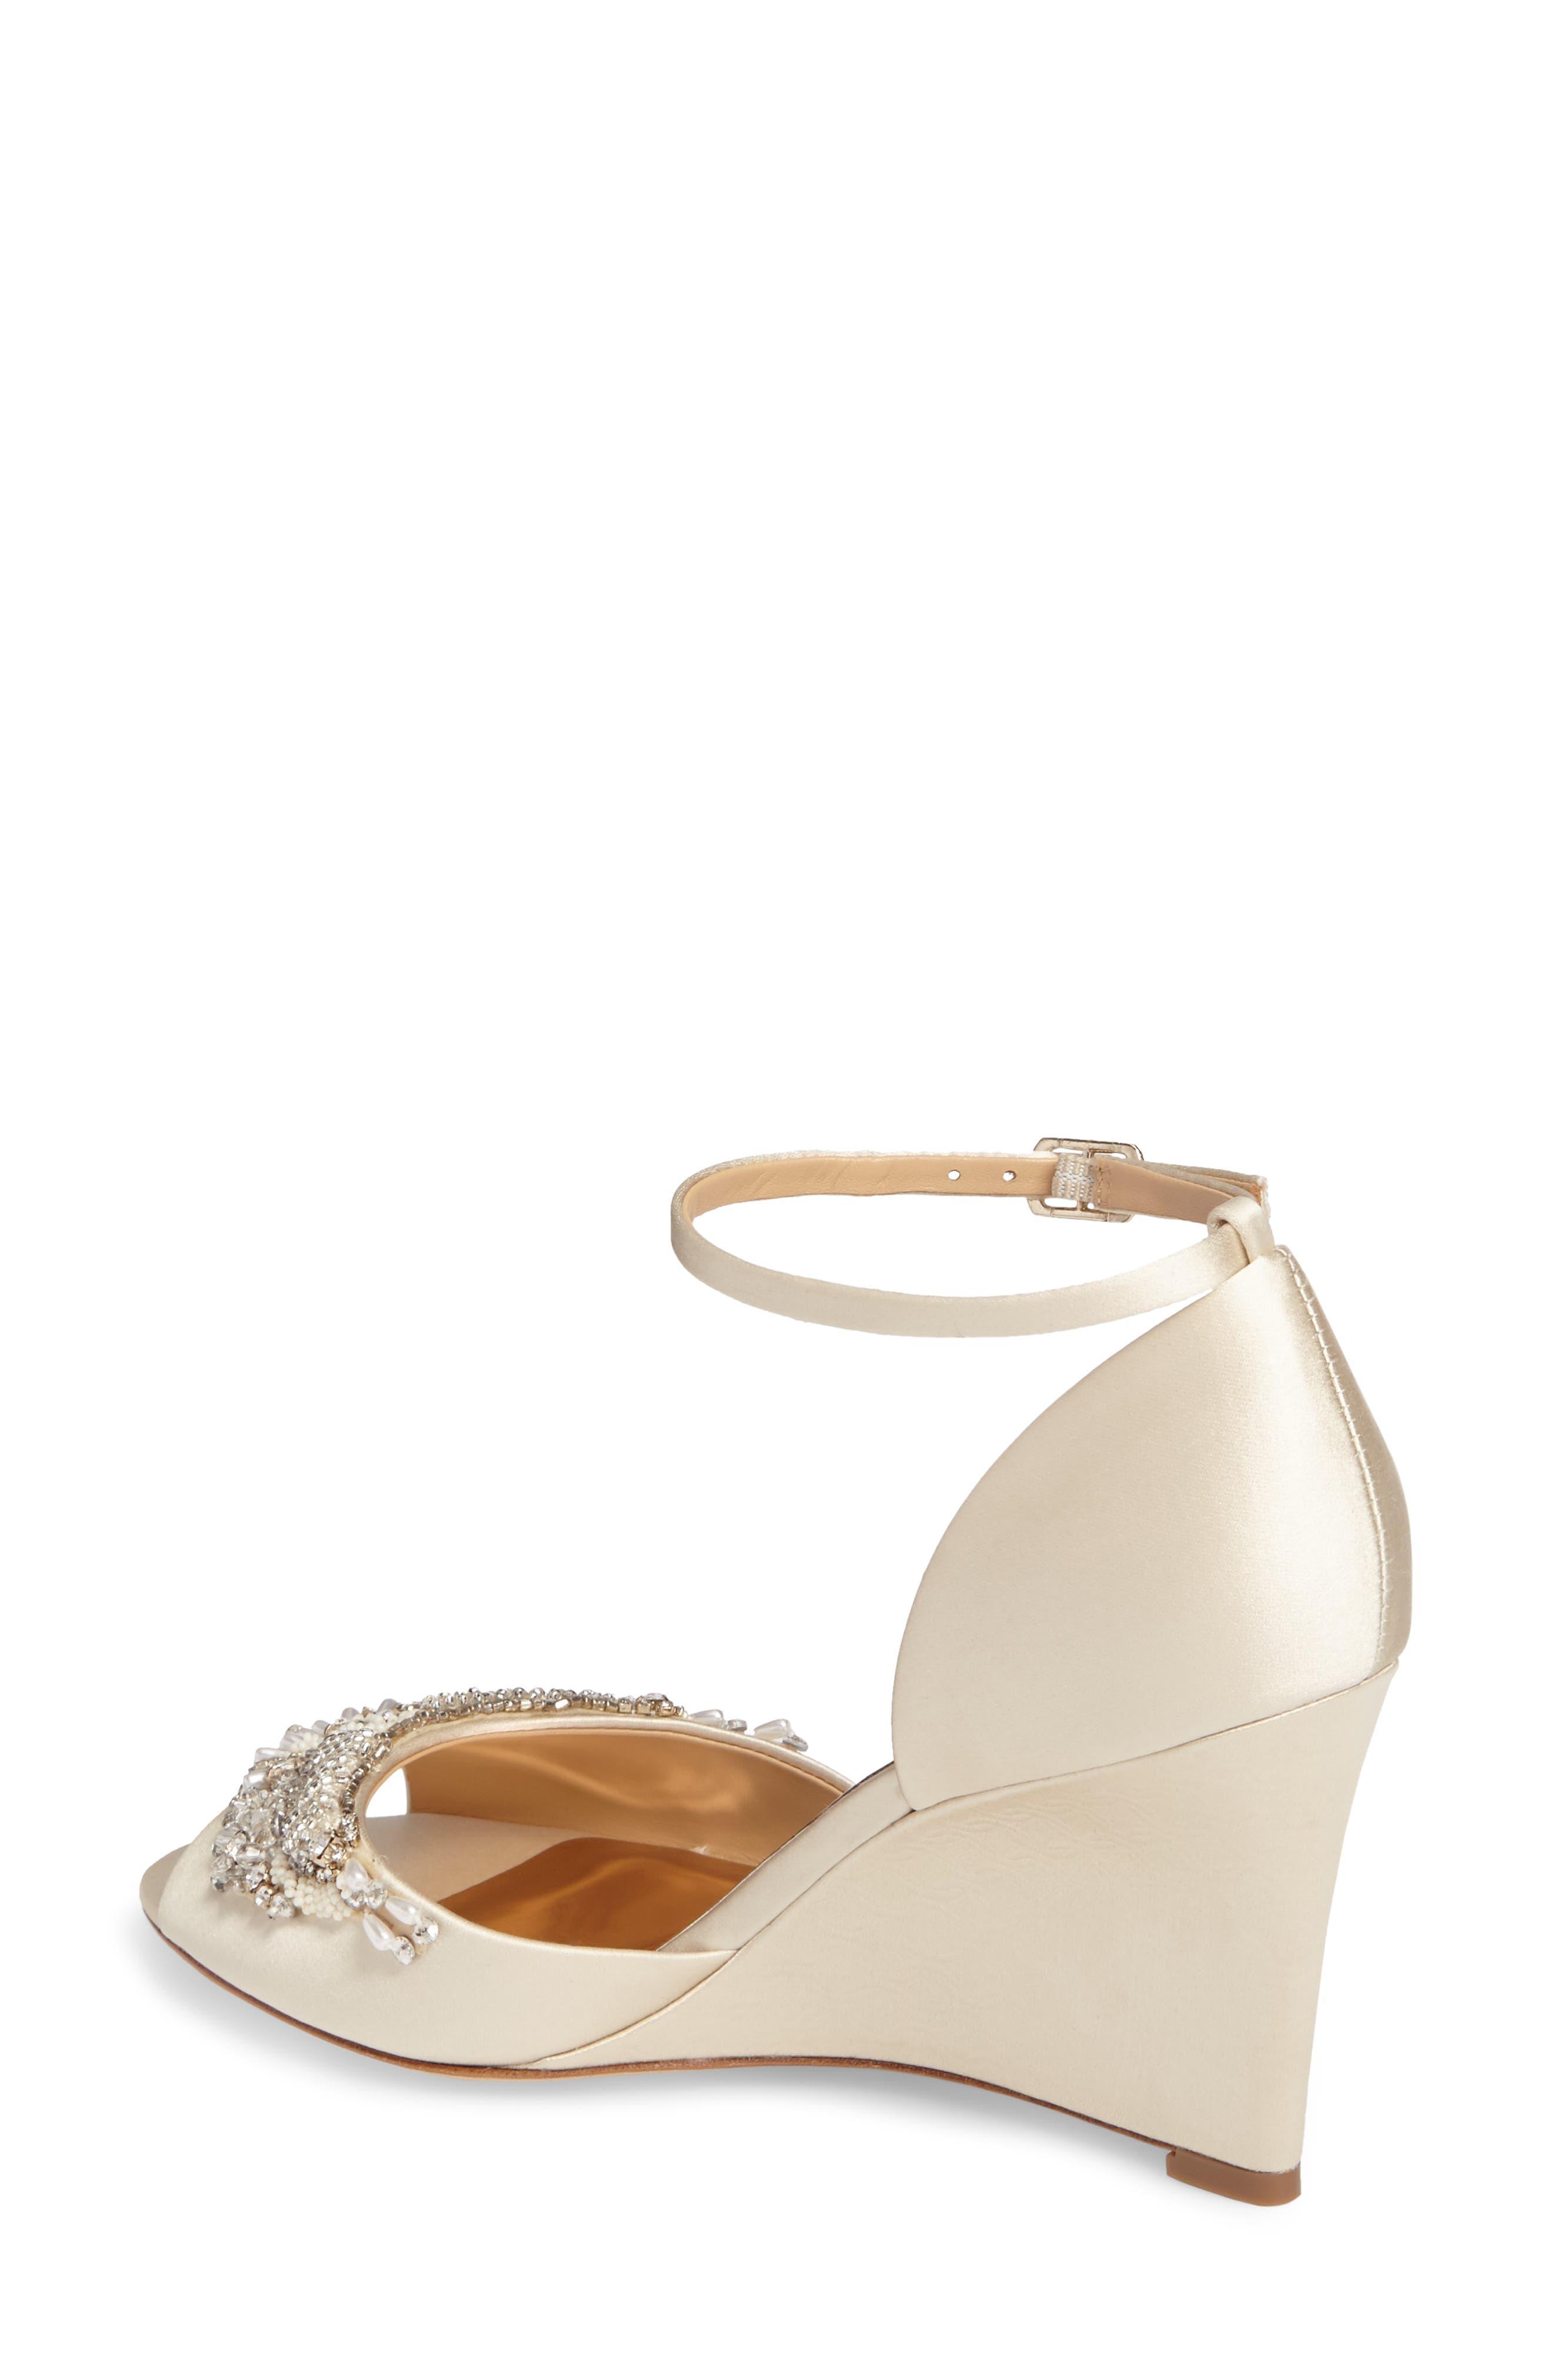 Malorie Embellished Sandal,                             Alternate thumbnail 4, color,